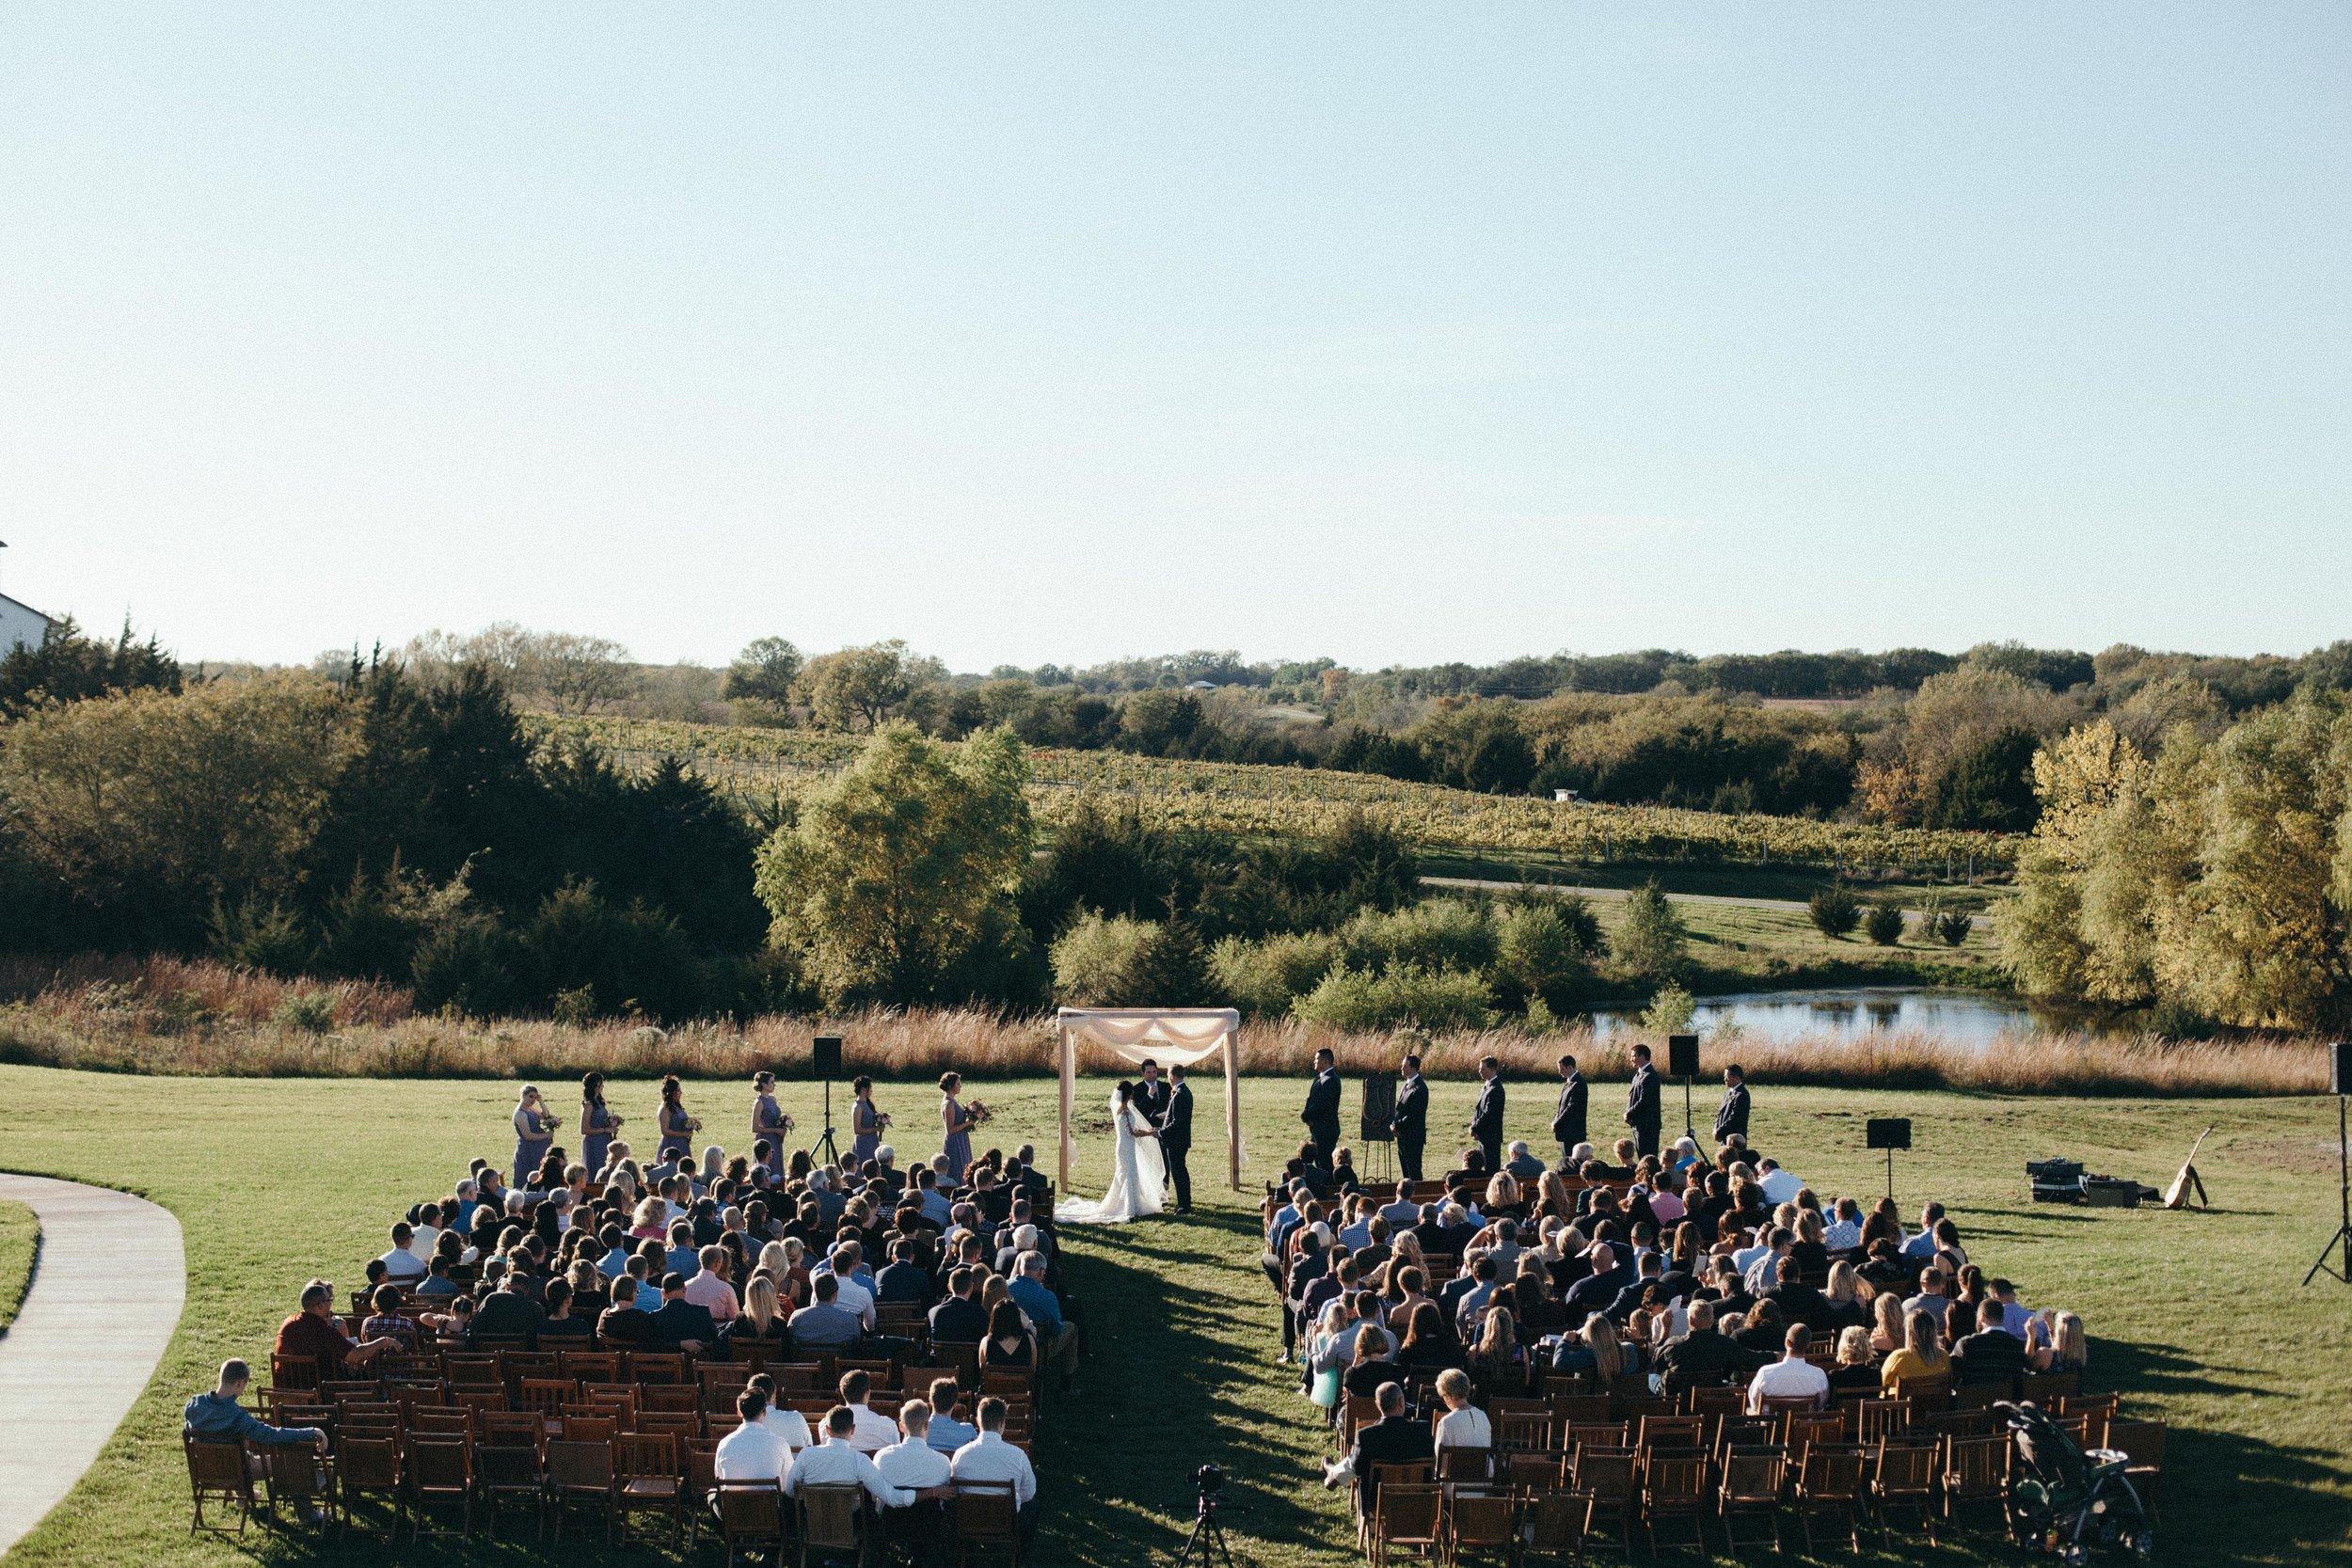 bailey-jared-wedding-blog-65.jpg